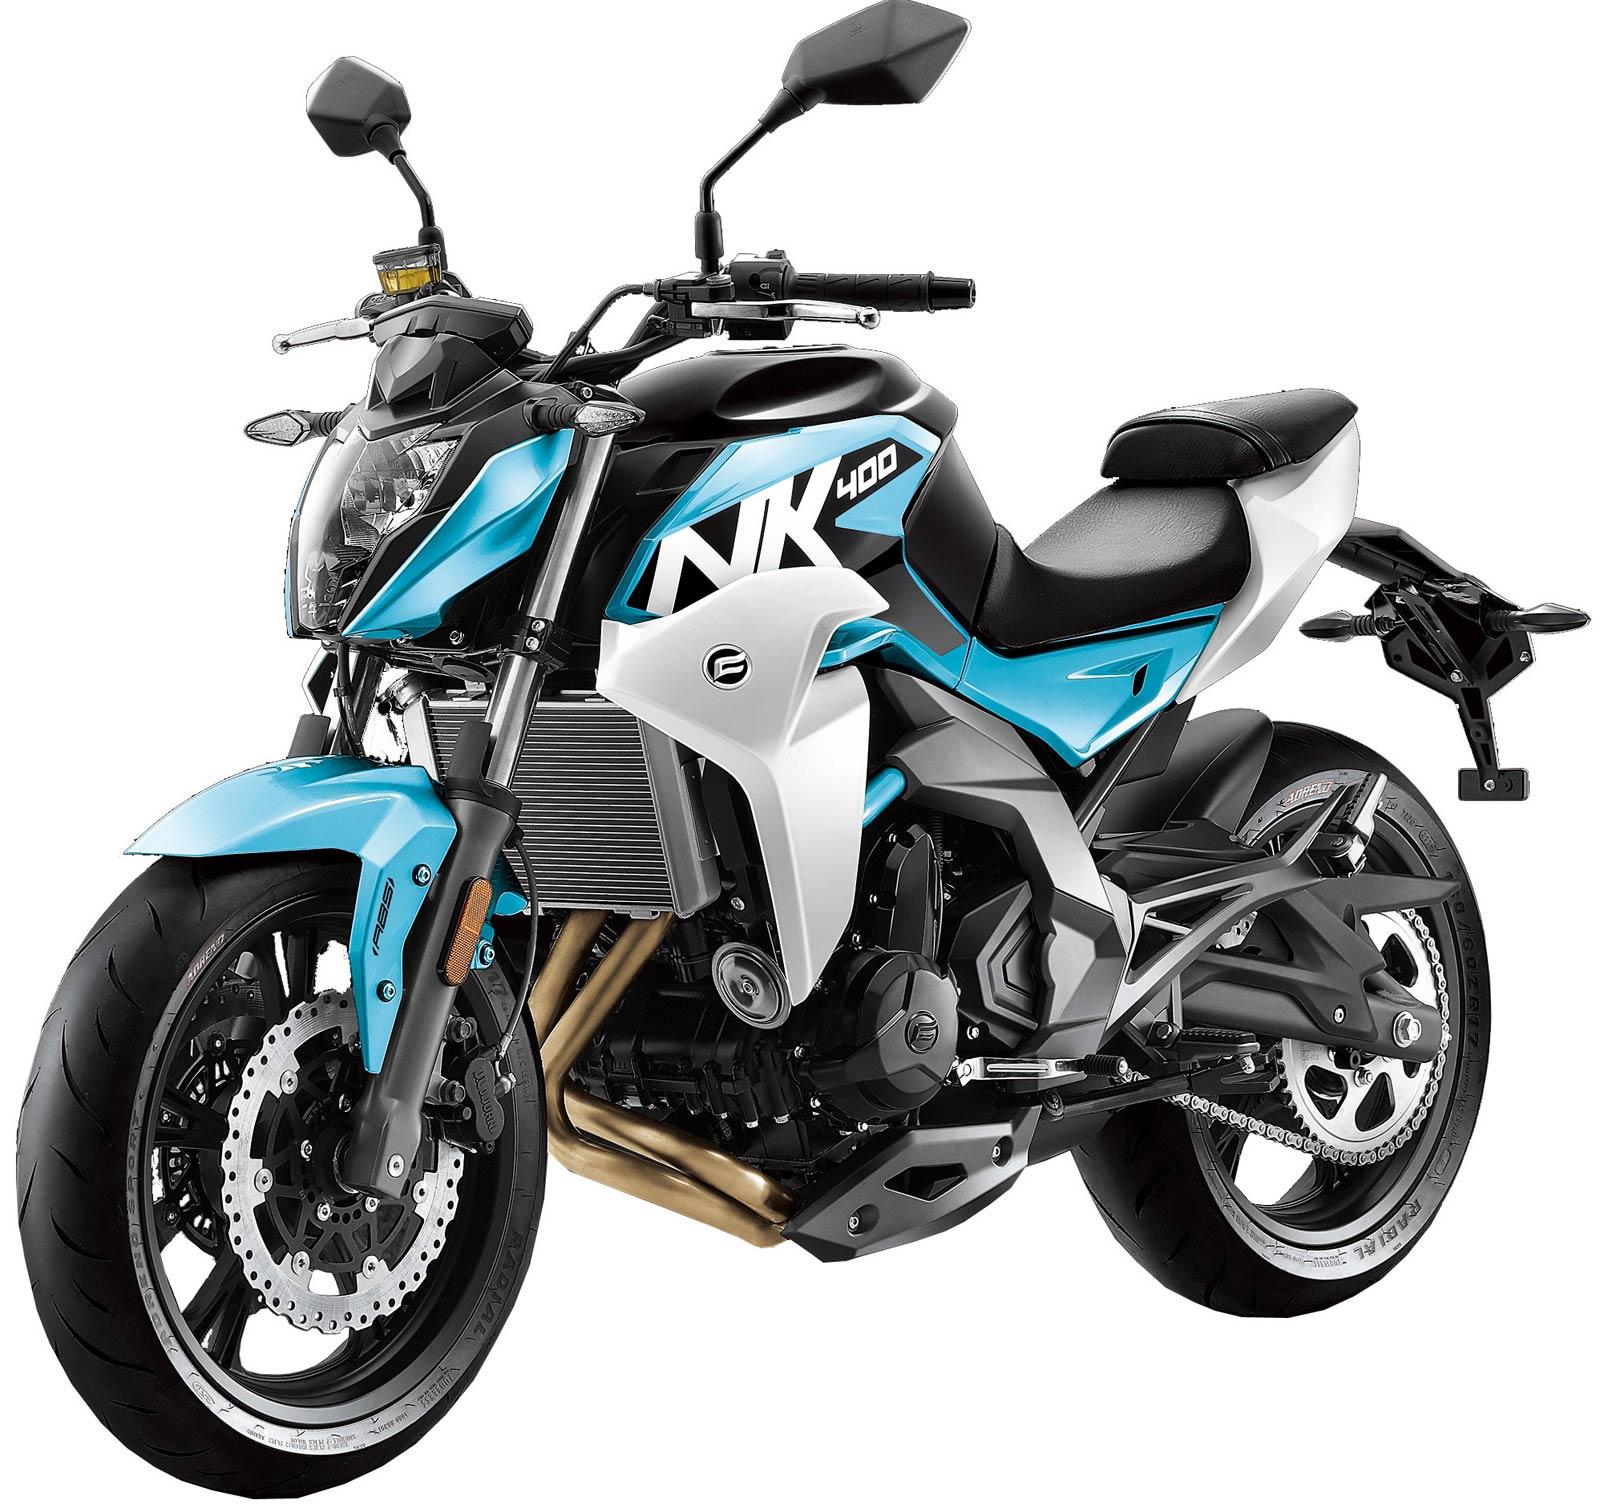 Motos Yamaha El Salvador